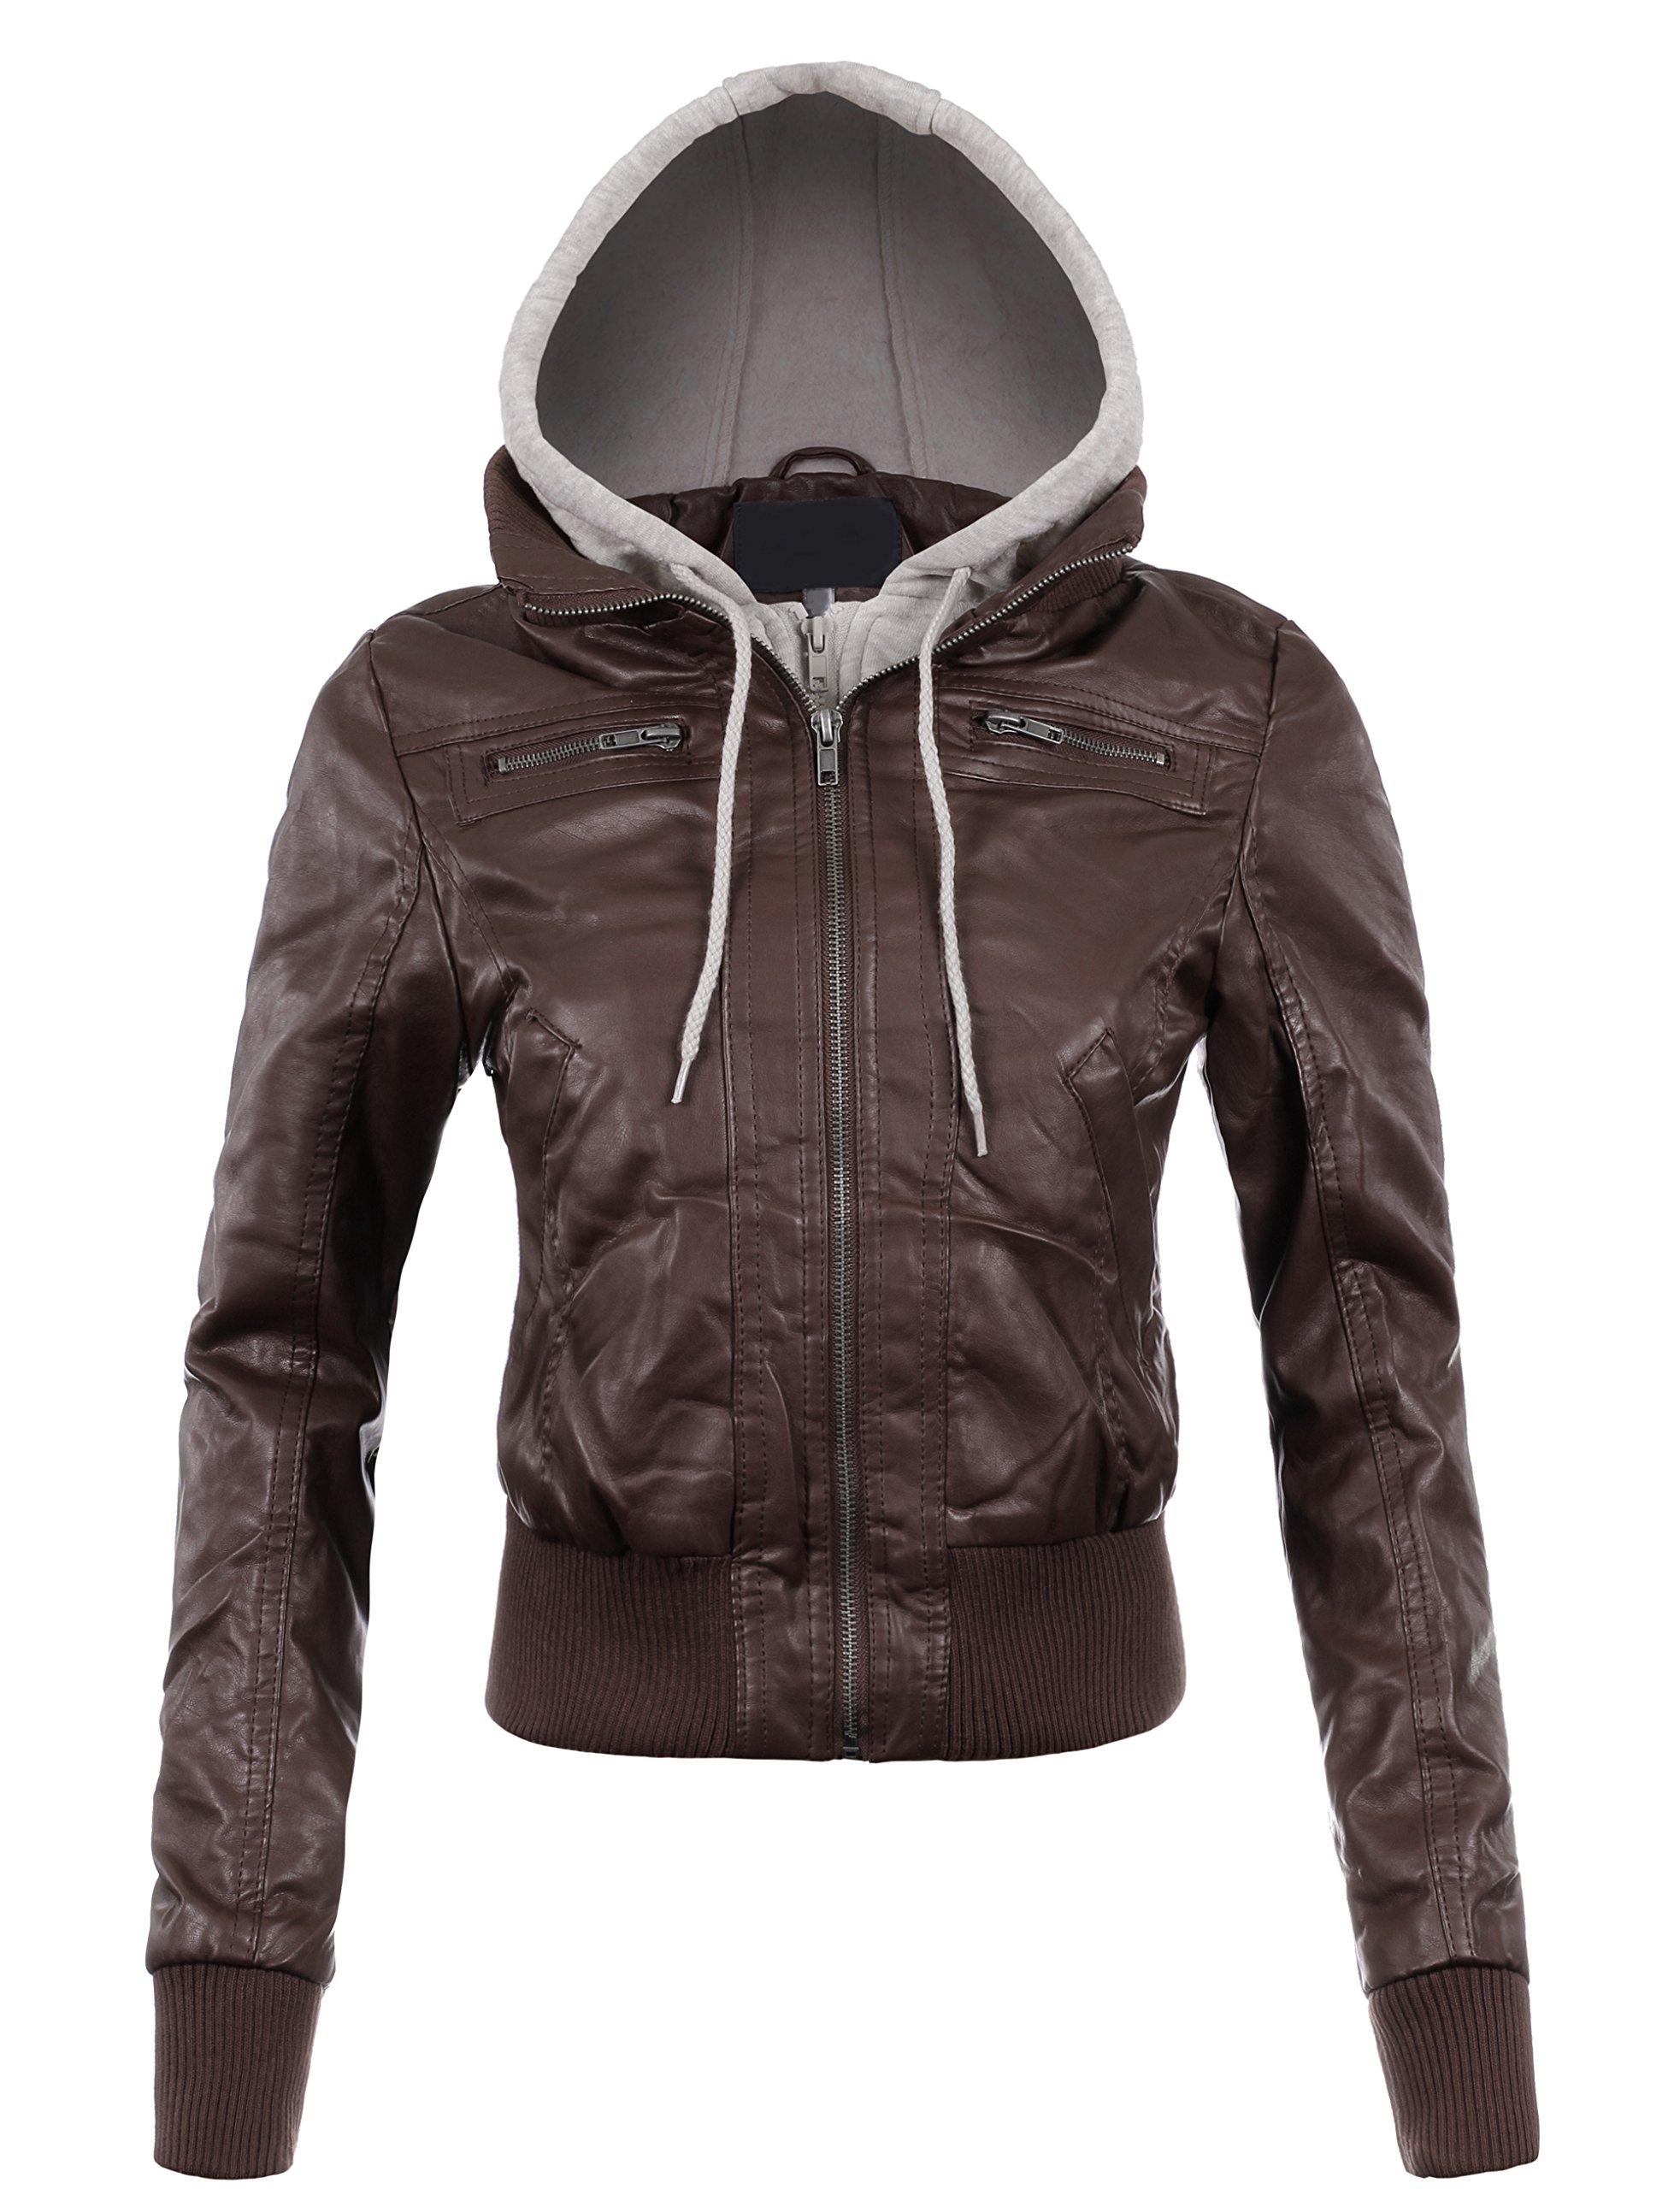 BEKTOME Womens Fleece Hood Faux Leather Zip Up Moto Biker Bomber Jacket -S-COFFEE